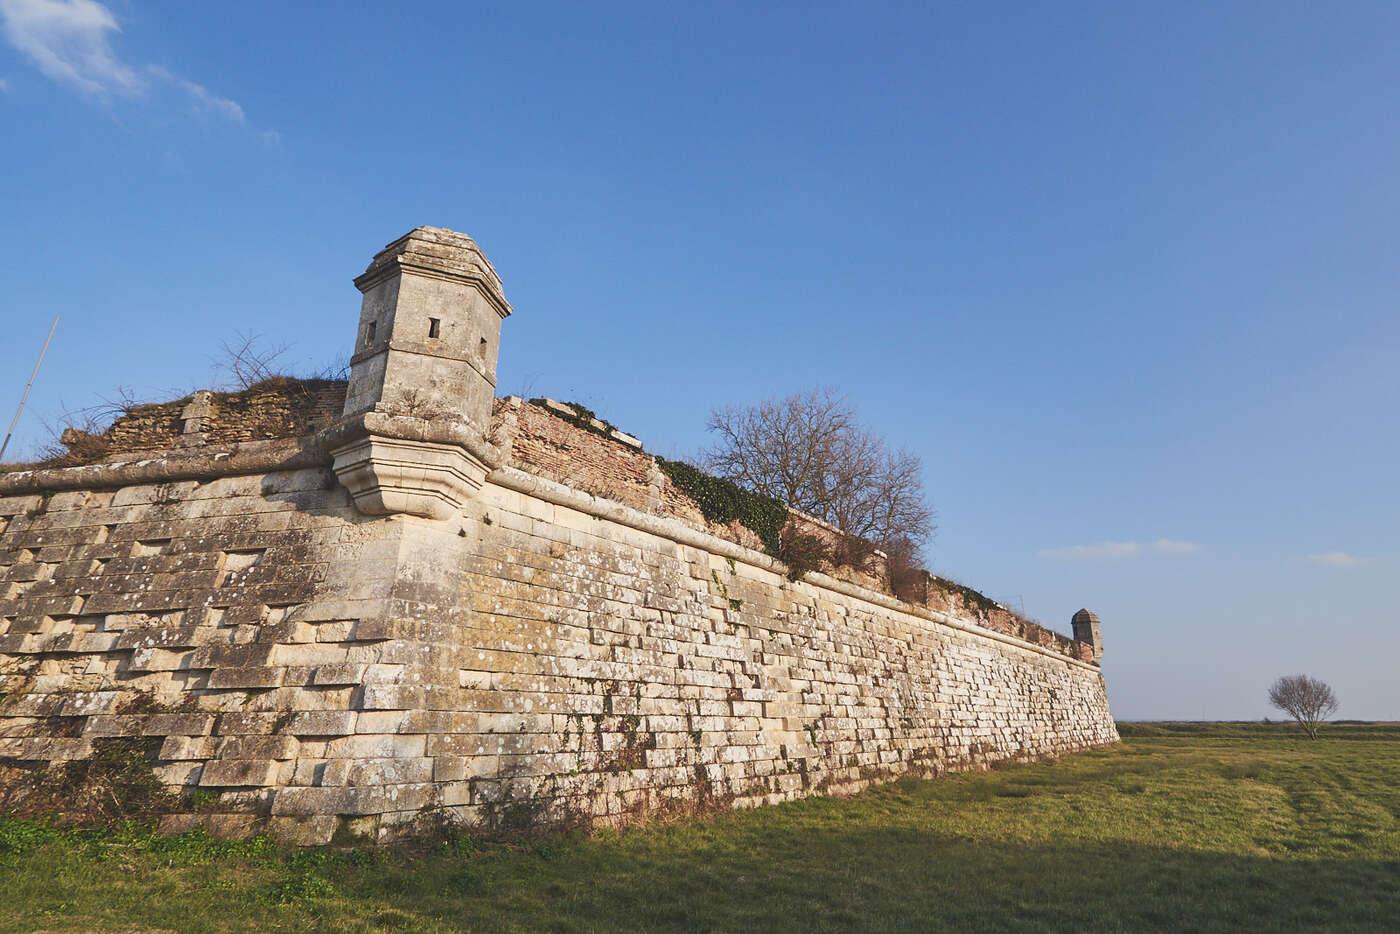 Fortification de Brouage